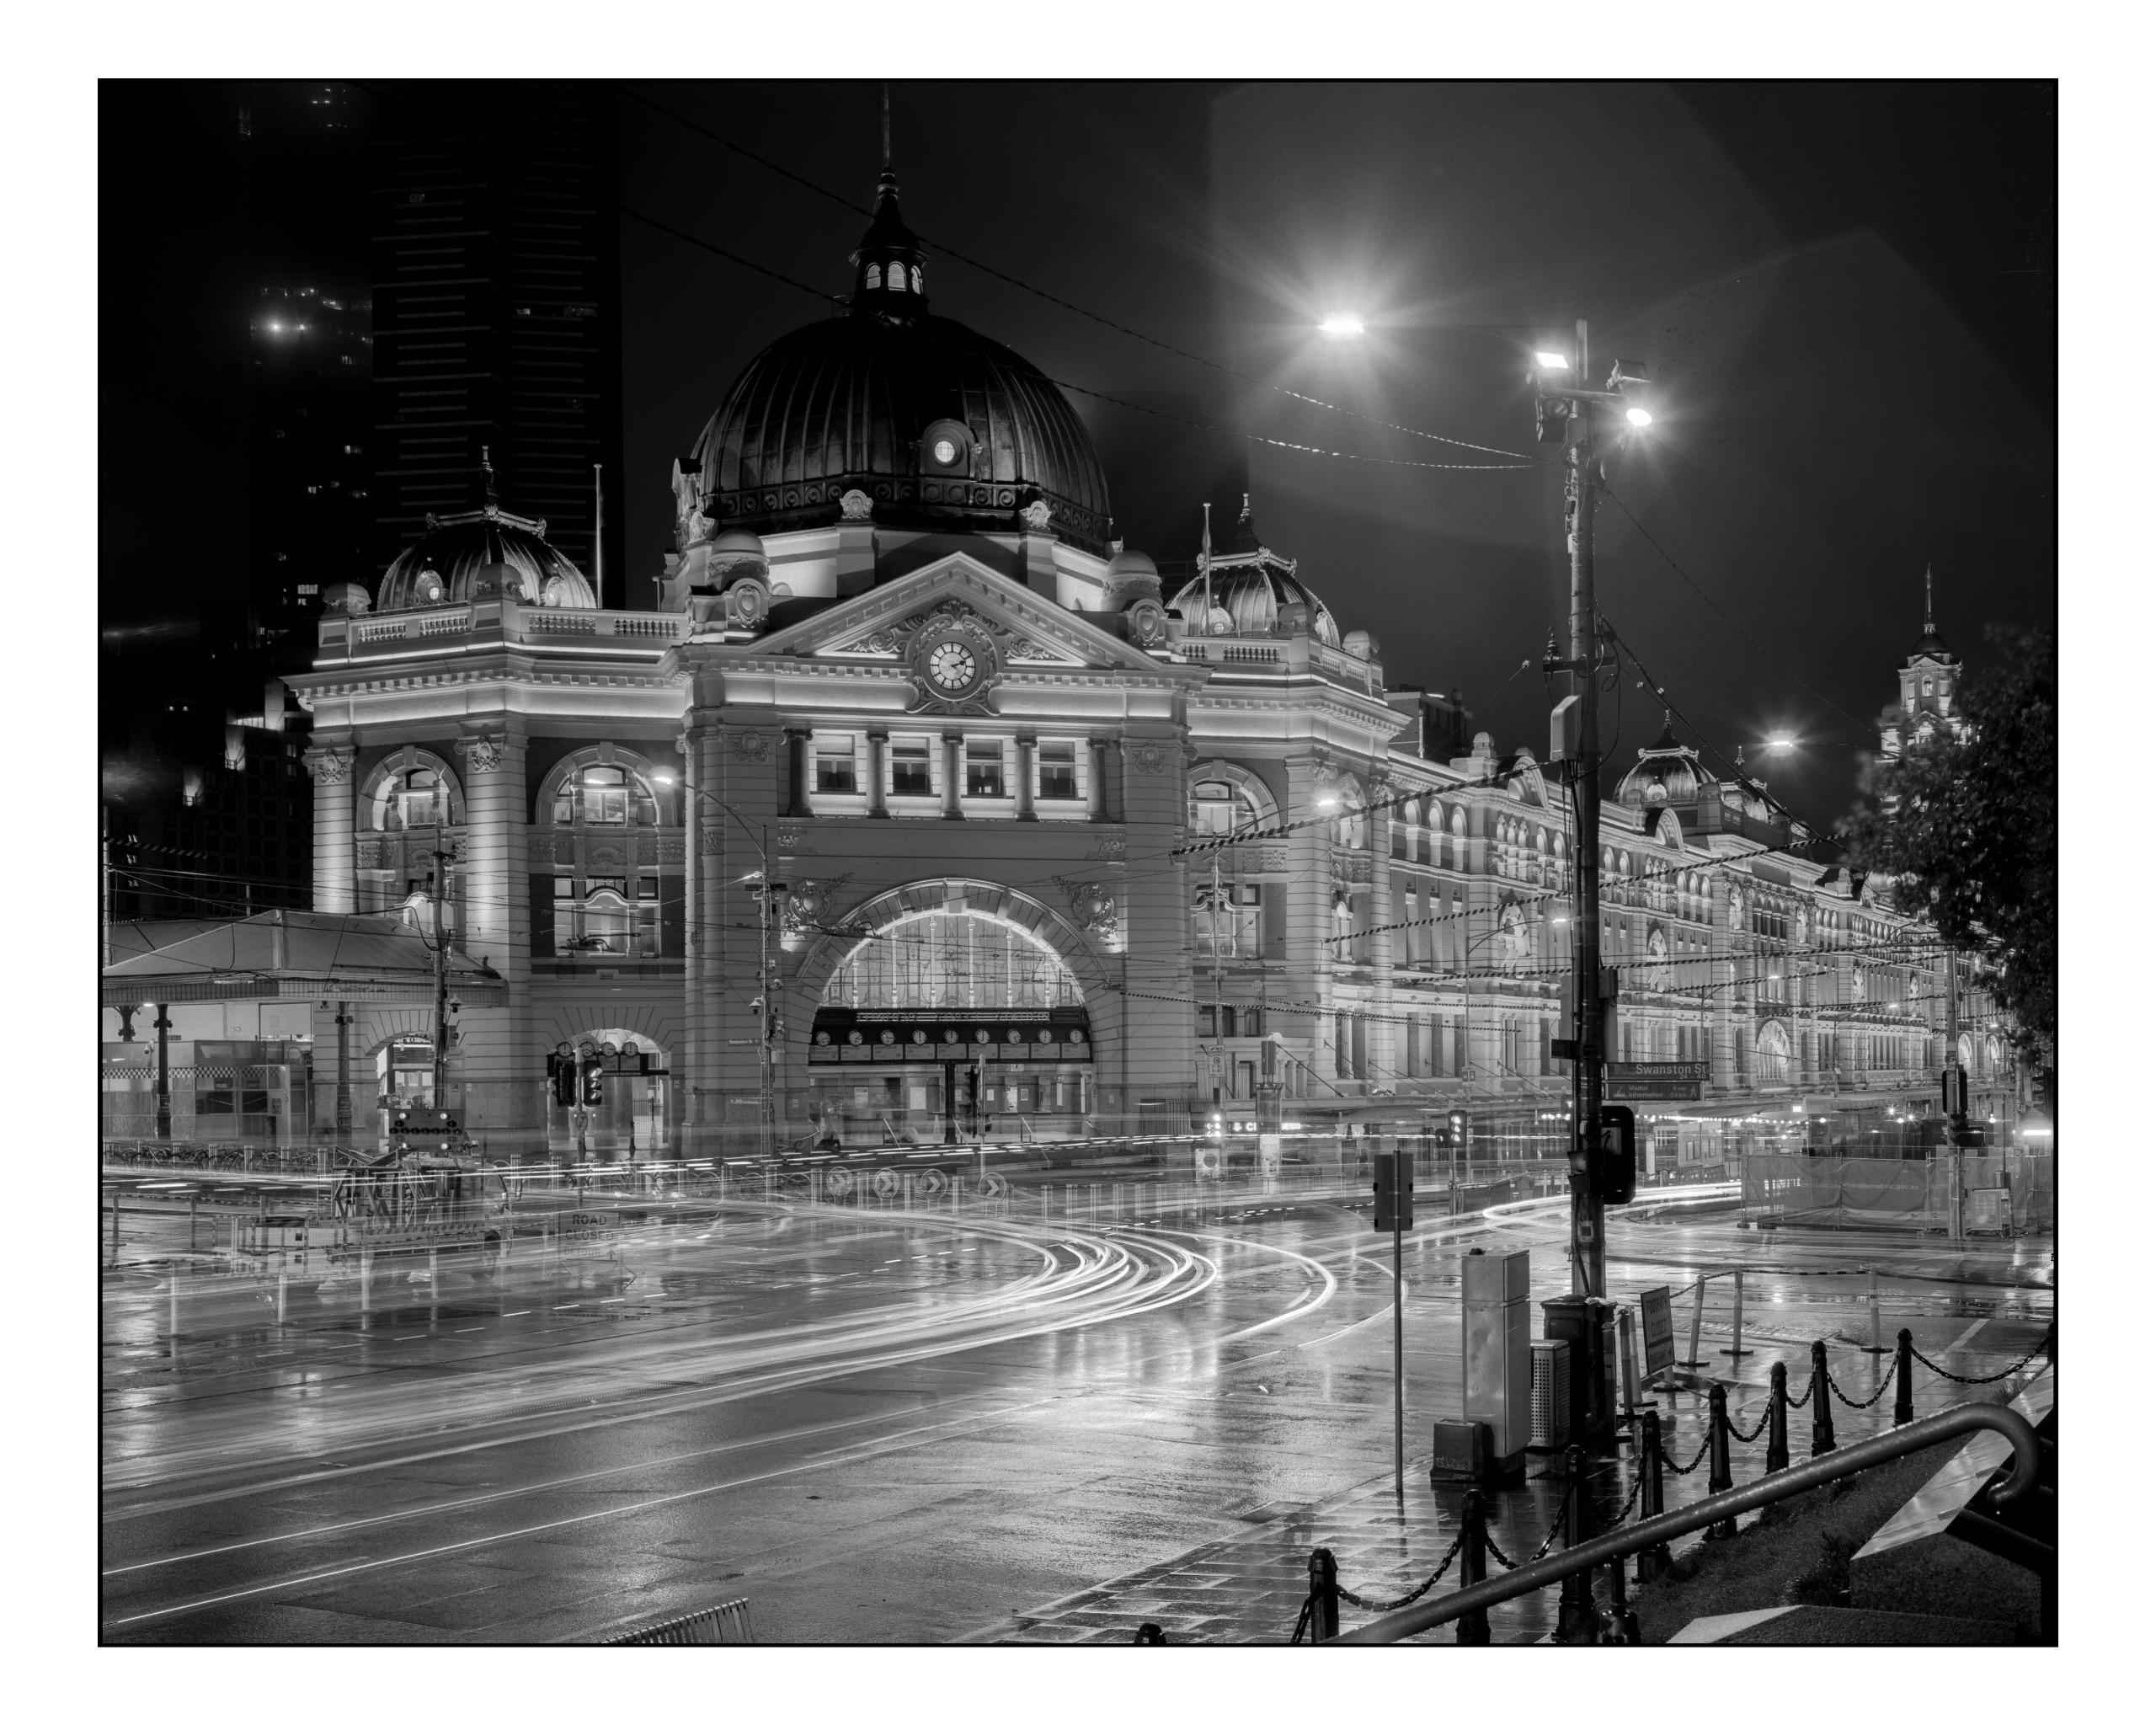 iconic Flinders St. Station Mel - dannytas_bnw | ello